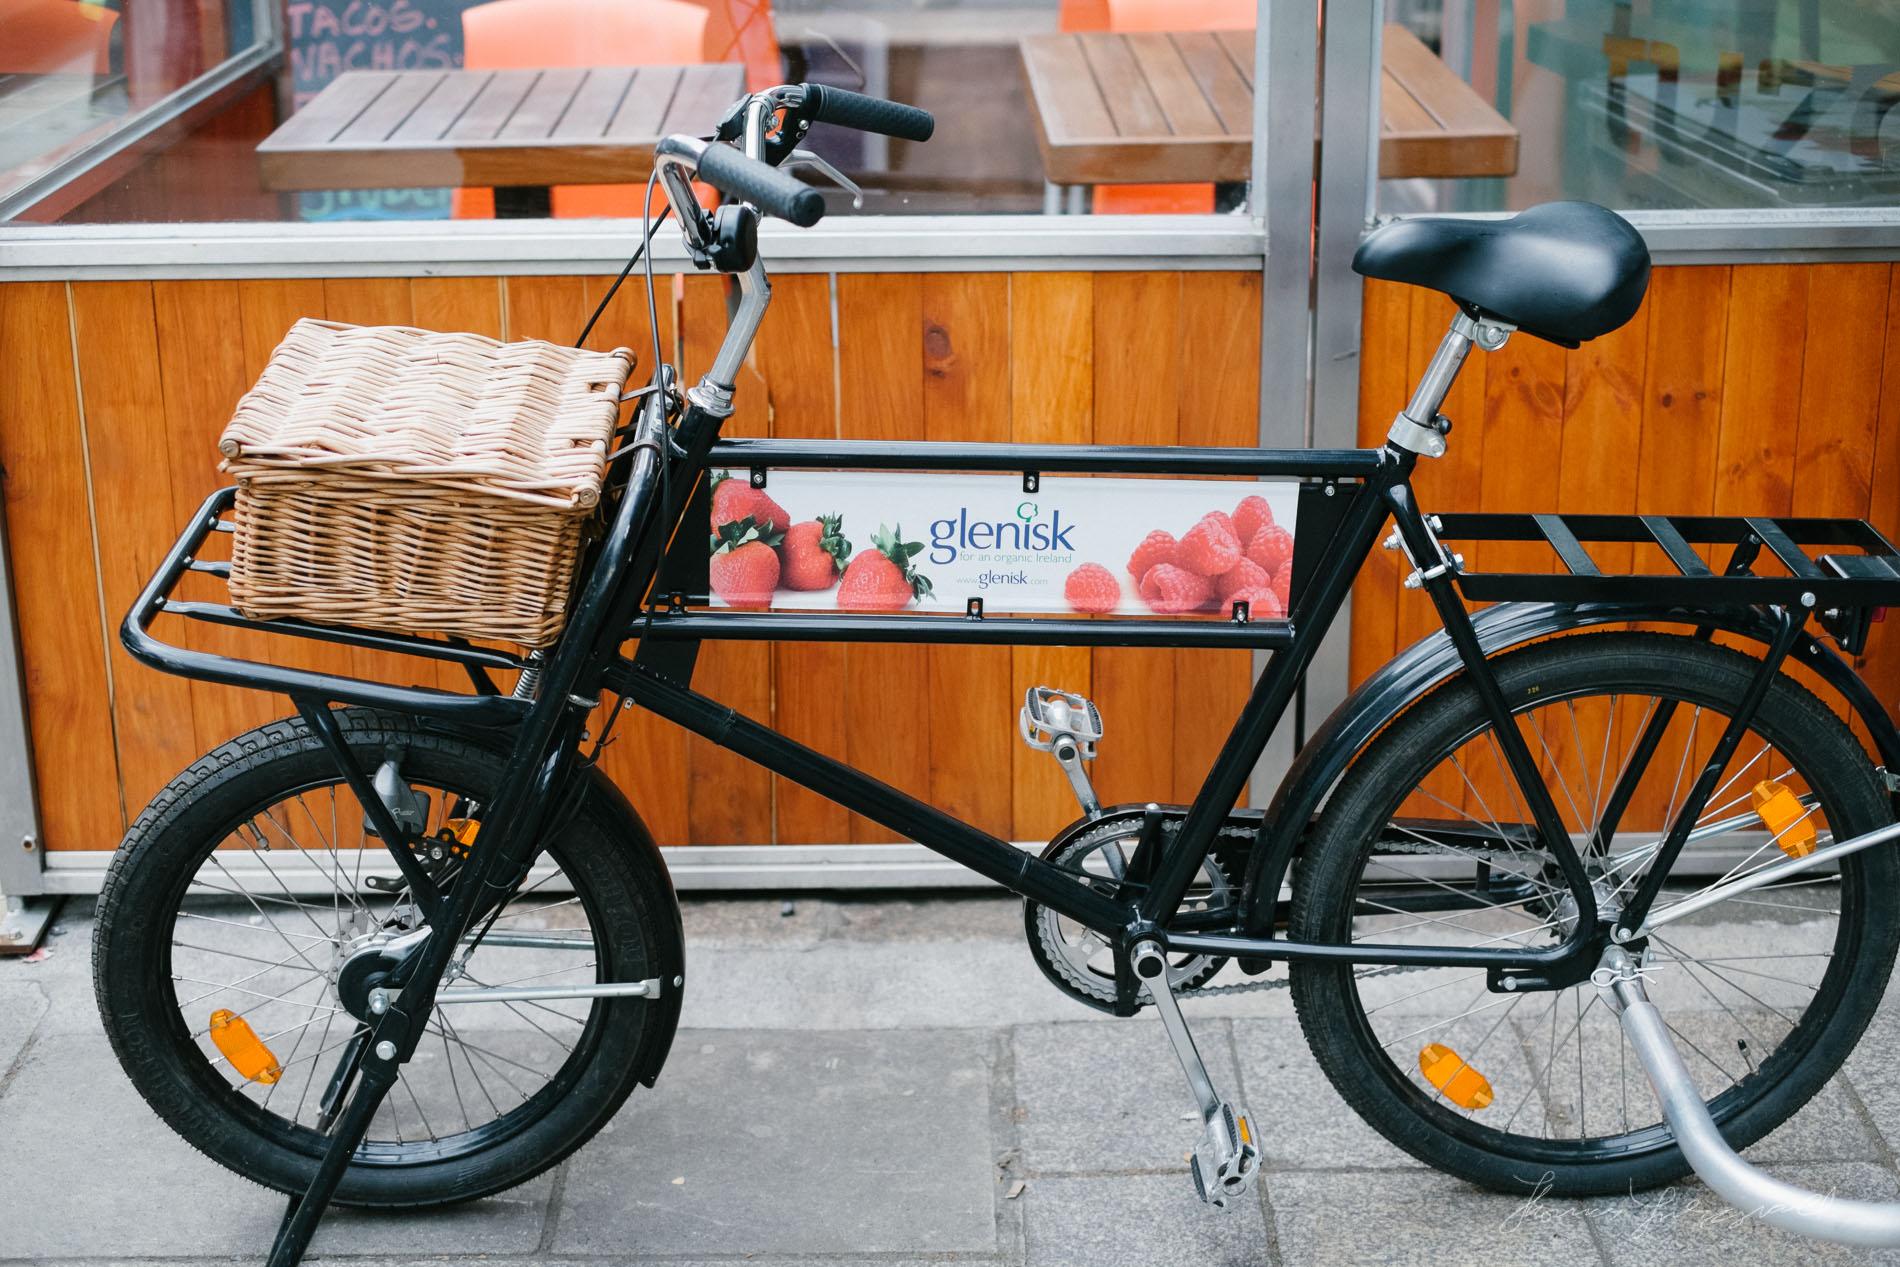 Glinisk Yogurt Bike in Dublin City